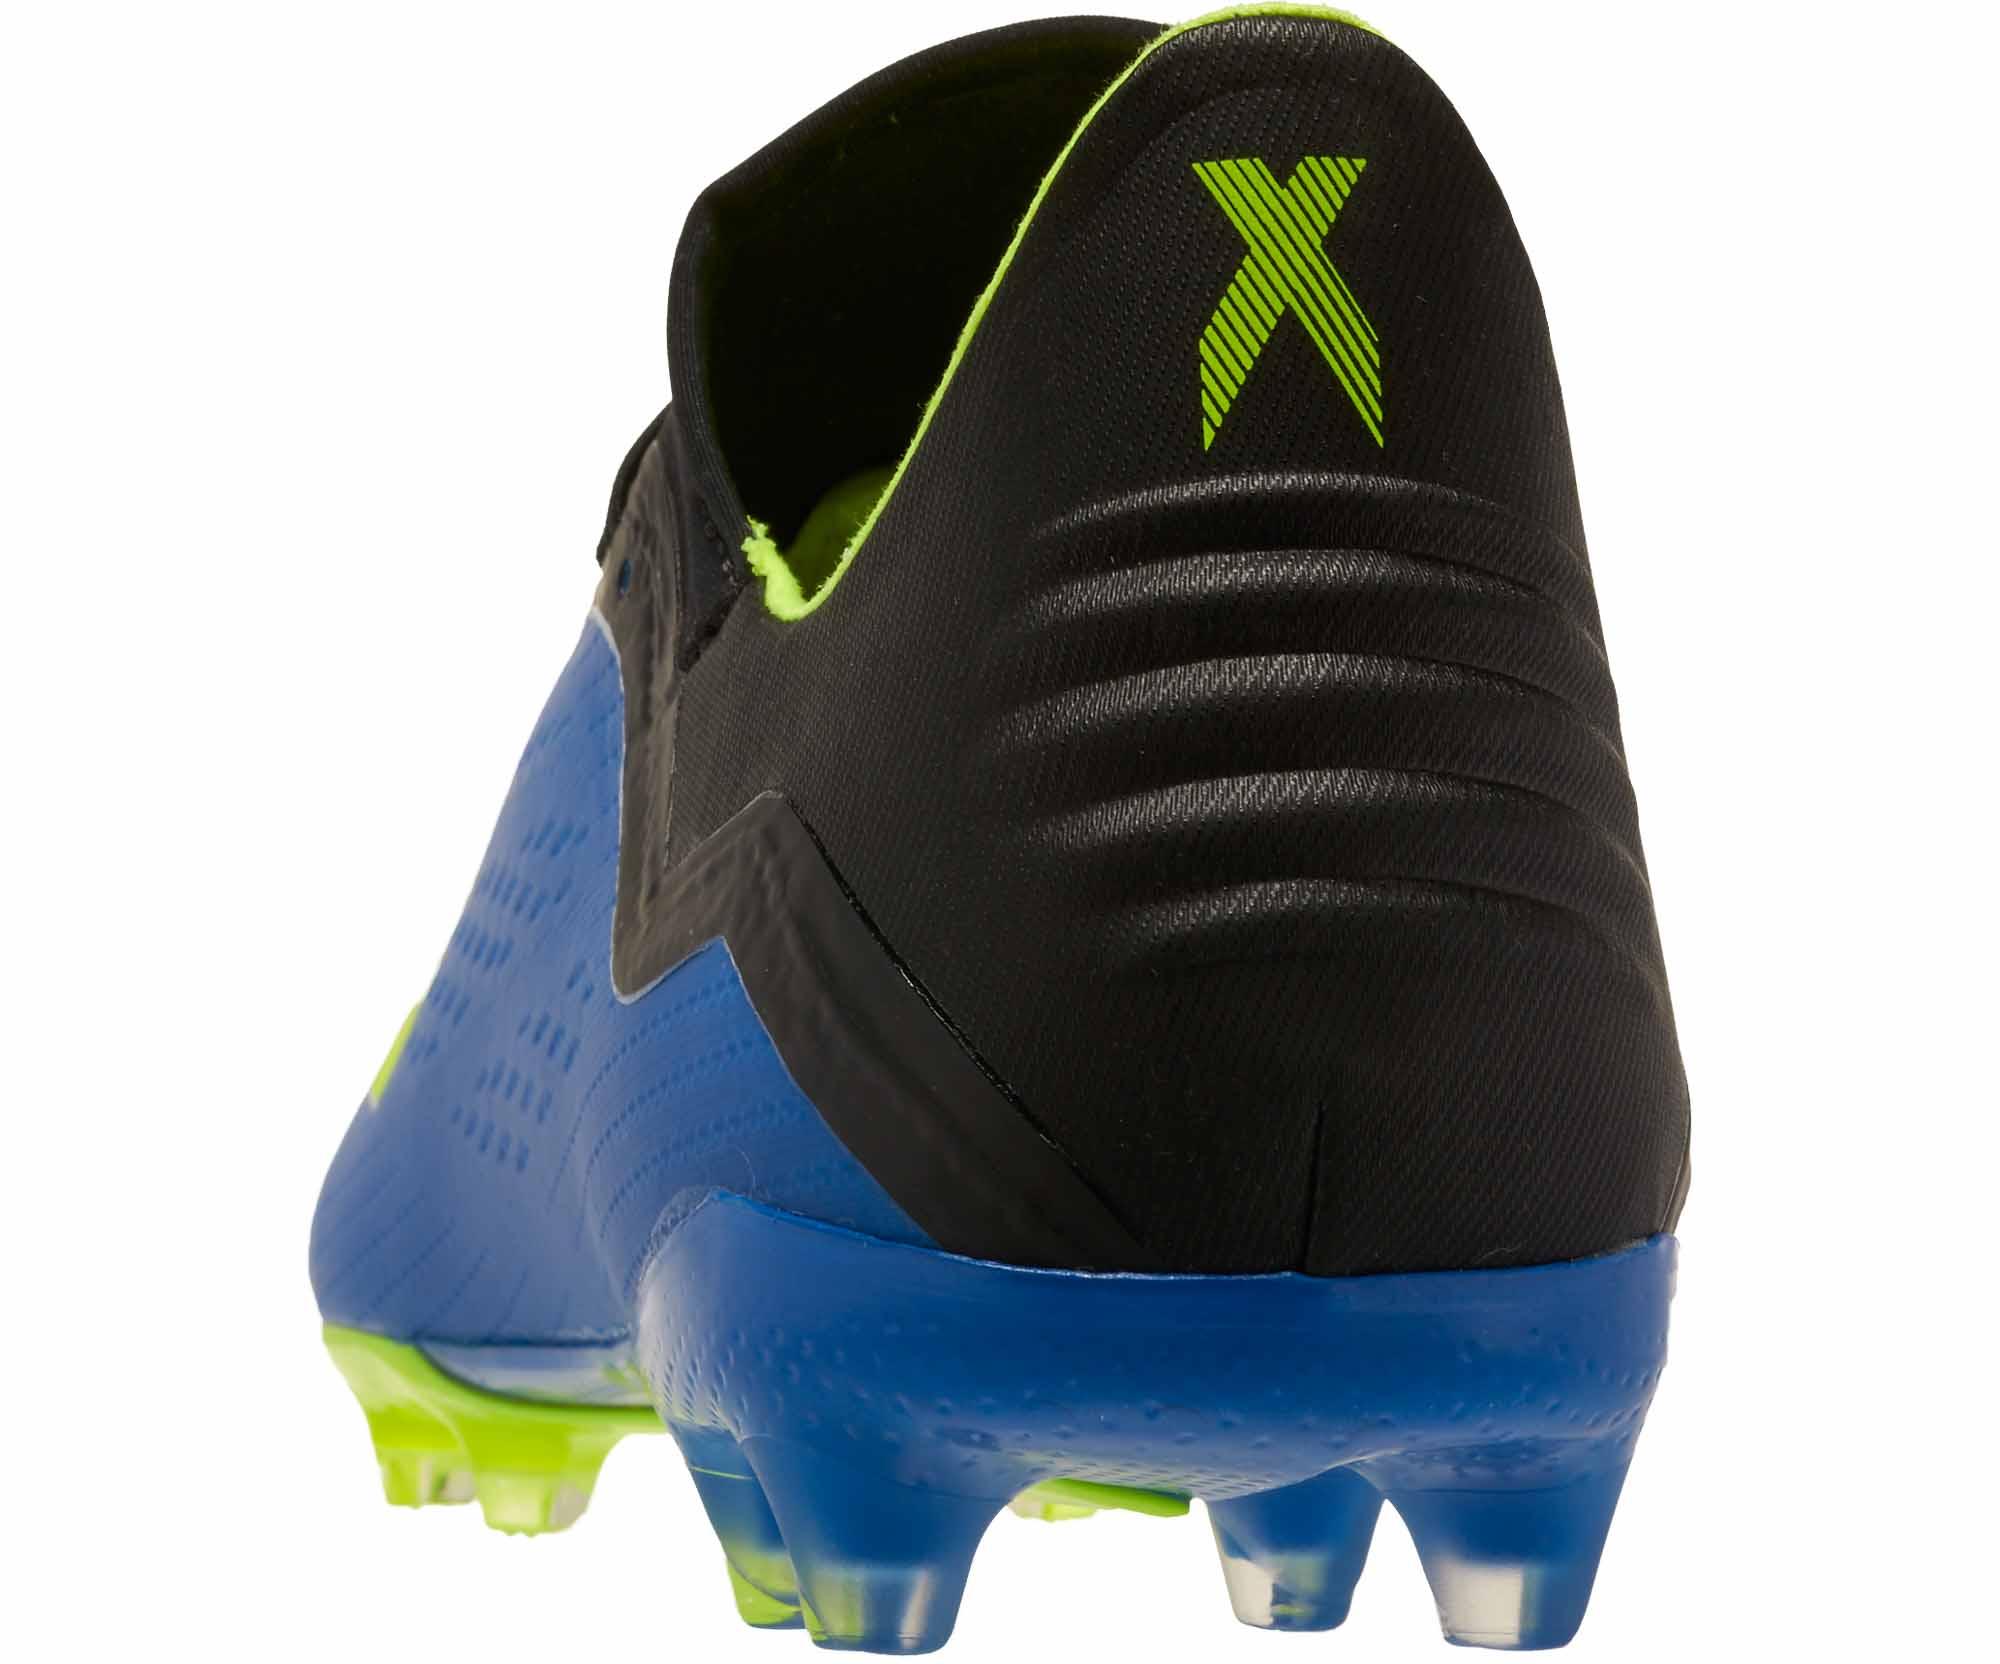 5ab61264440 adidas X 18.2 FG - Football Blue Solar Yellow Black - Soccer Master